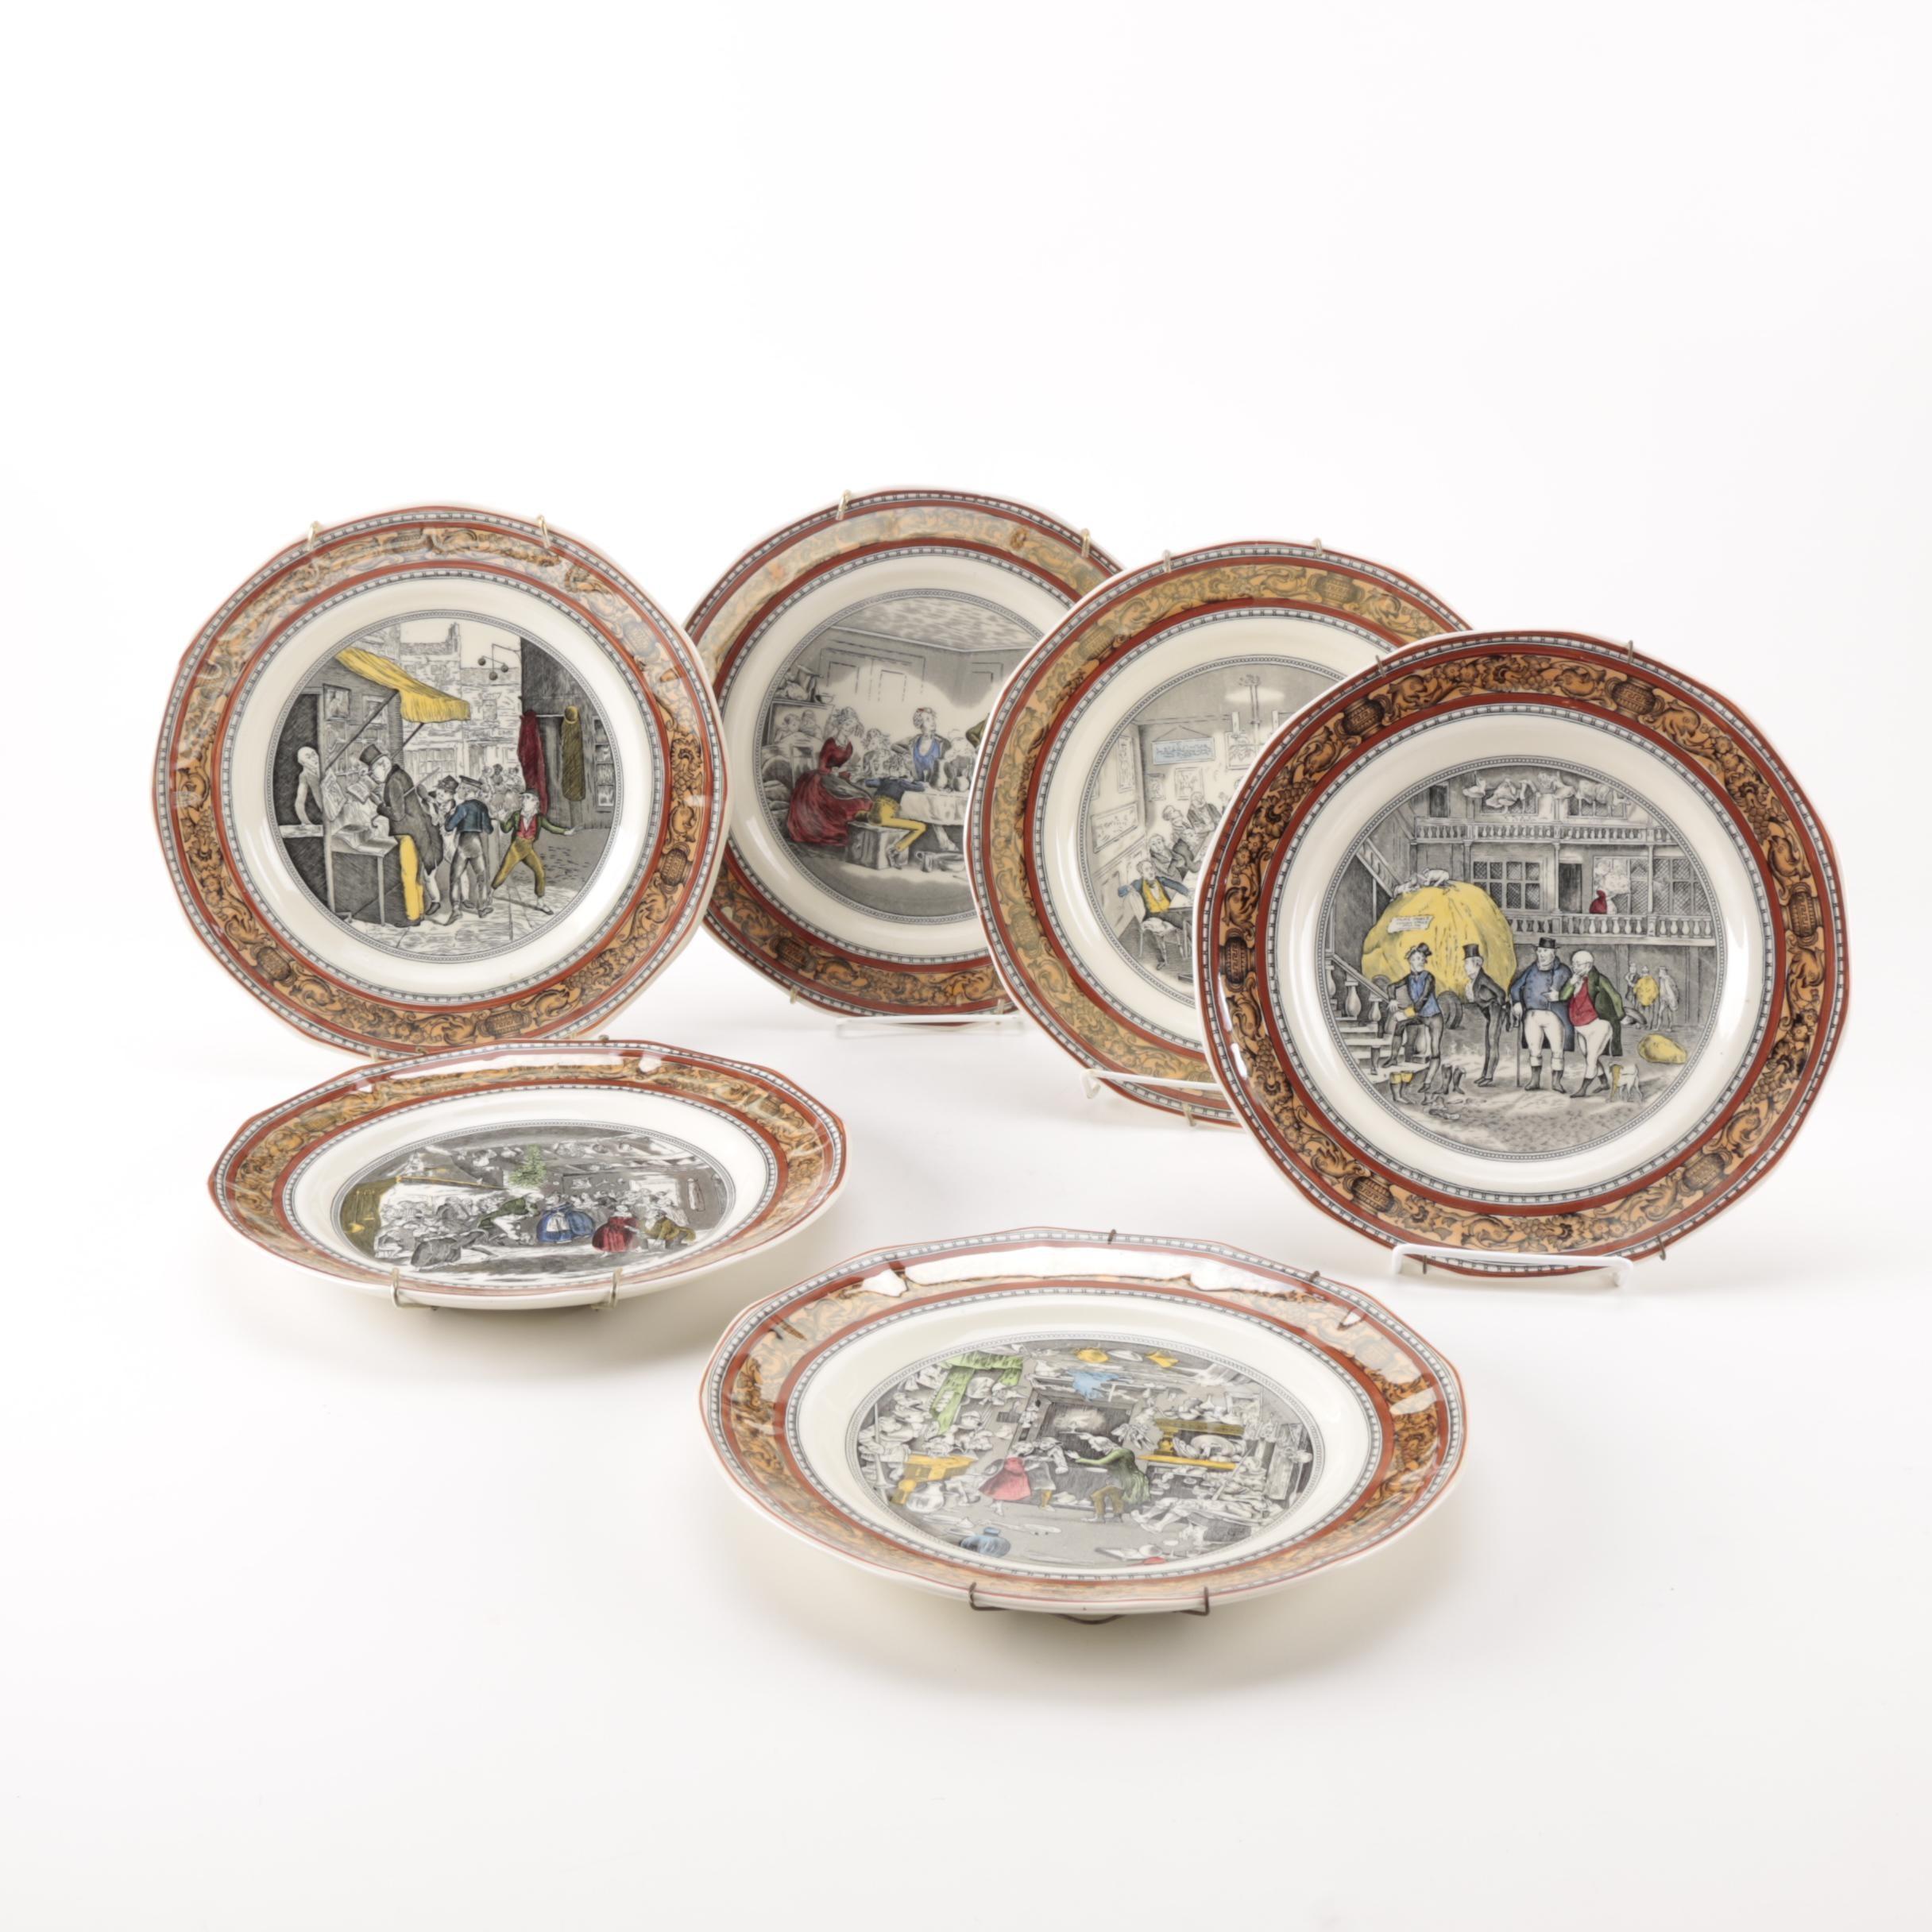 Charles Dickens Ironstone Plates